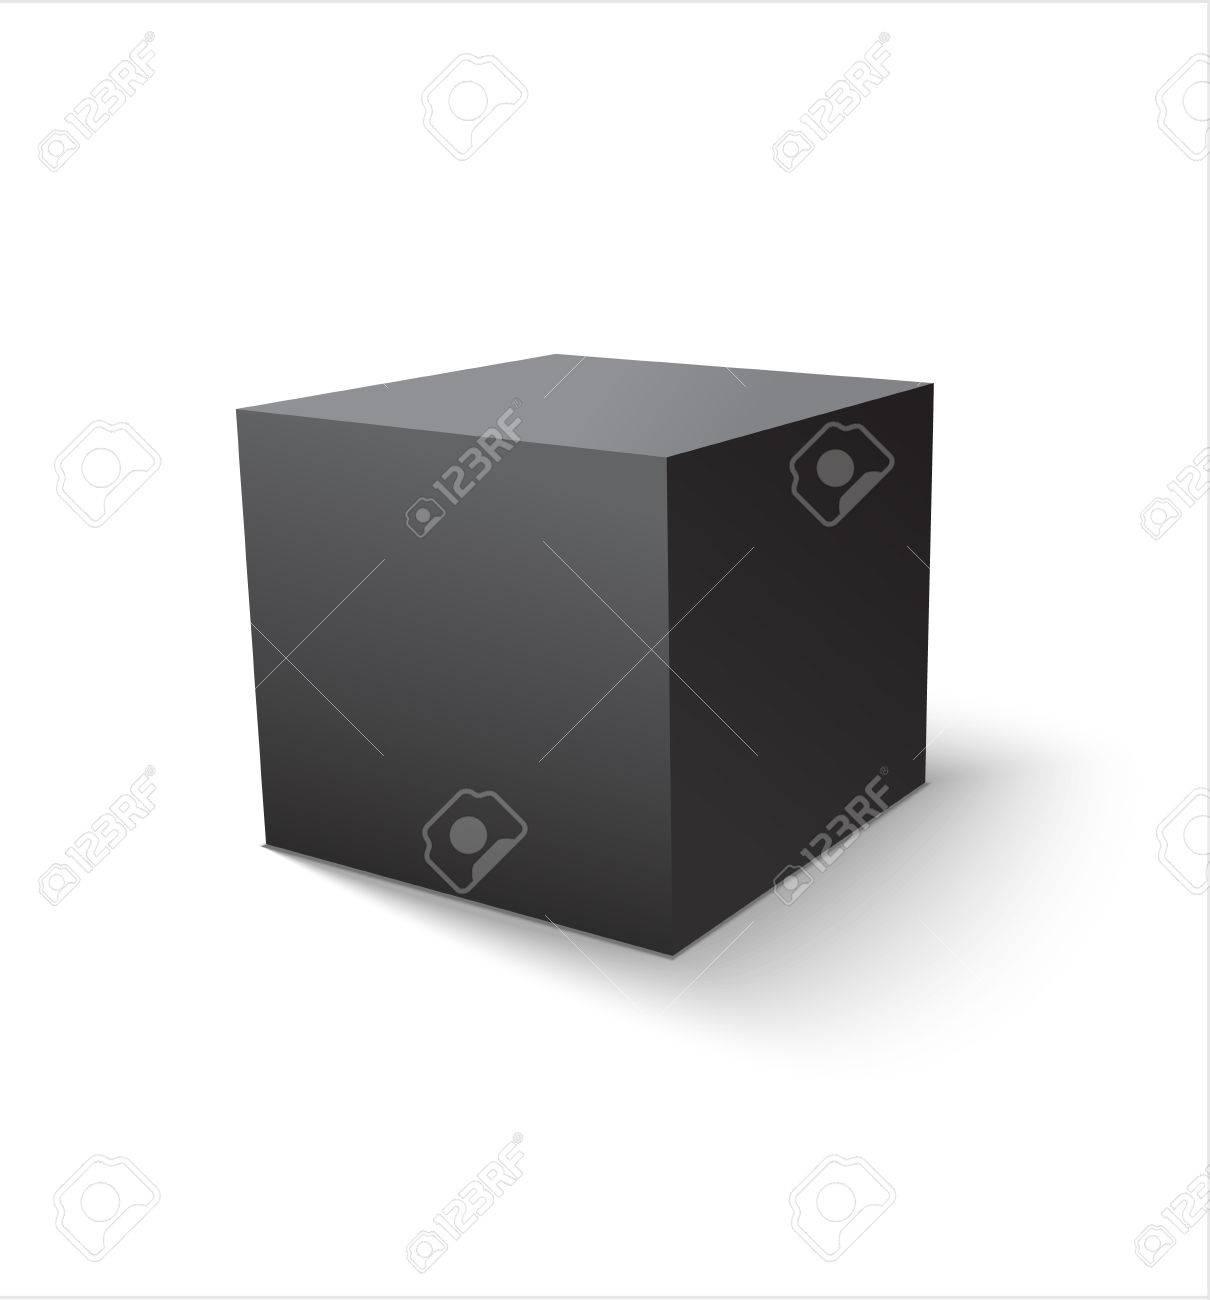 box black icon template for your design vector illustration